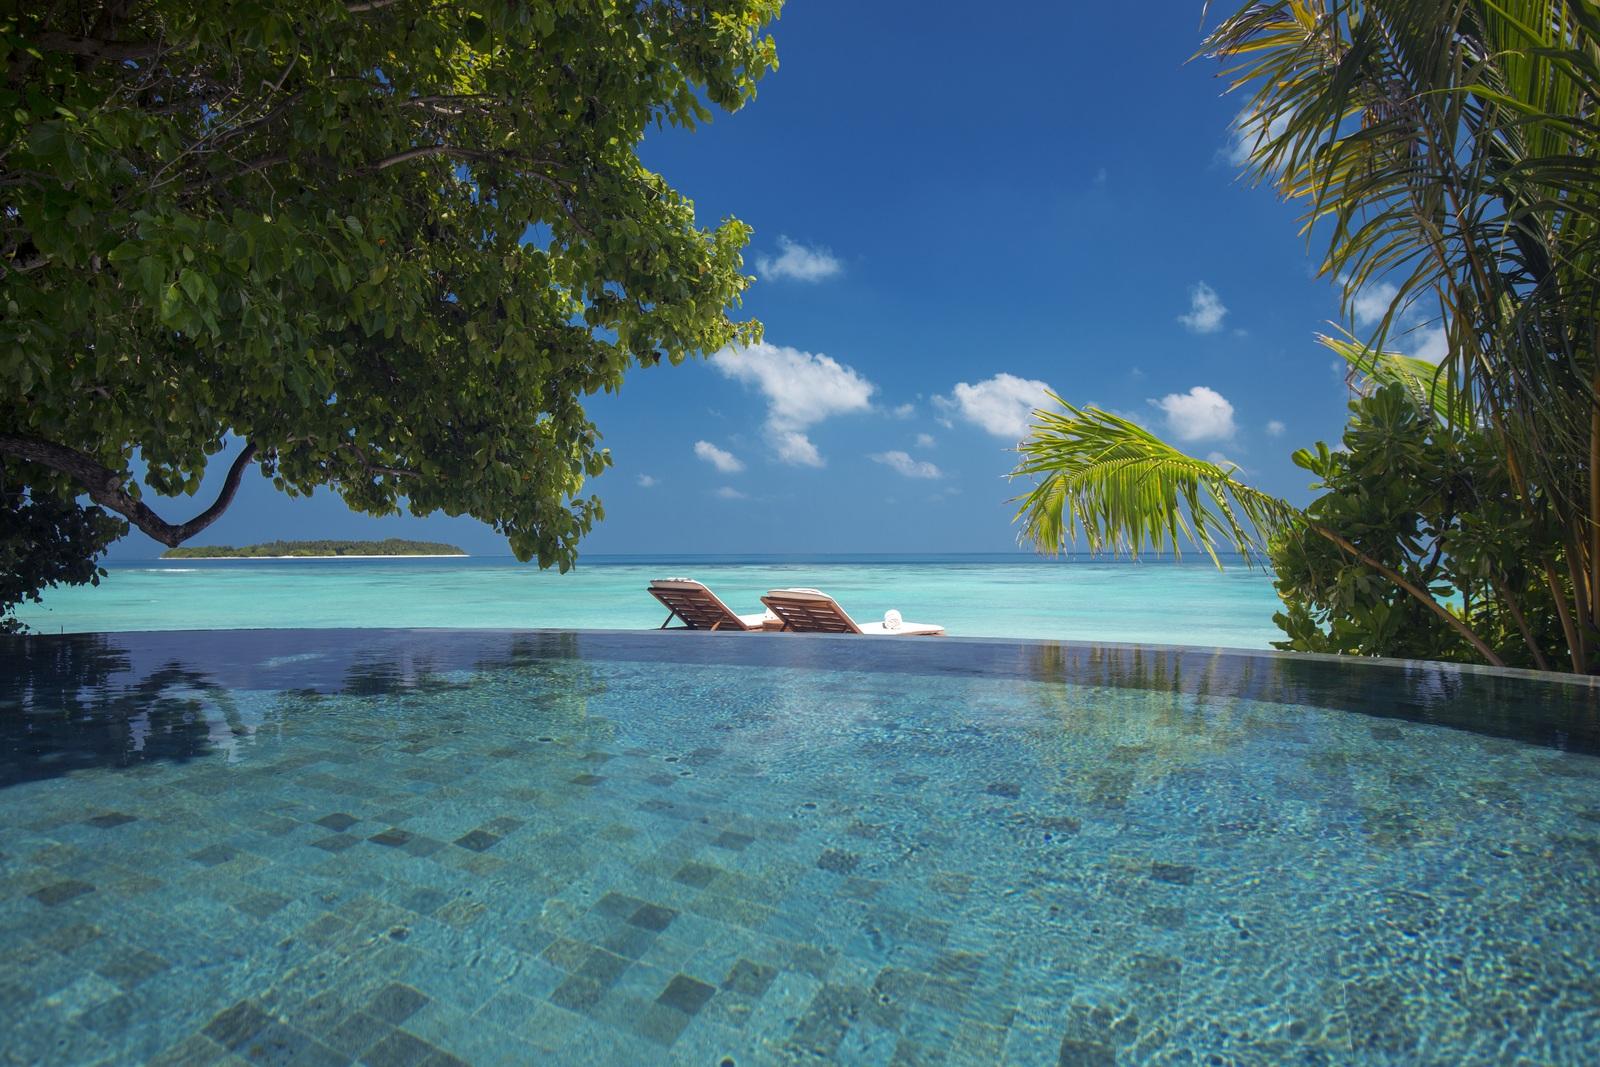 Malediven    die neue Trauminsel Milaidhoo im Baa Atoll strand sonne reisebericht malediven honeymoon 2  Milaidhoo Maldives Beach Pool Villa 11 jpeg